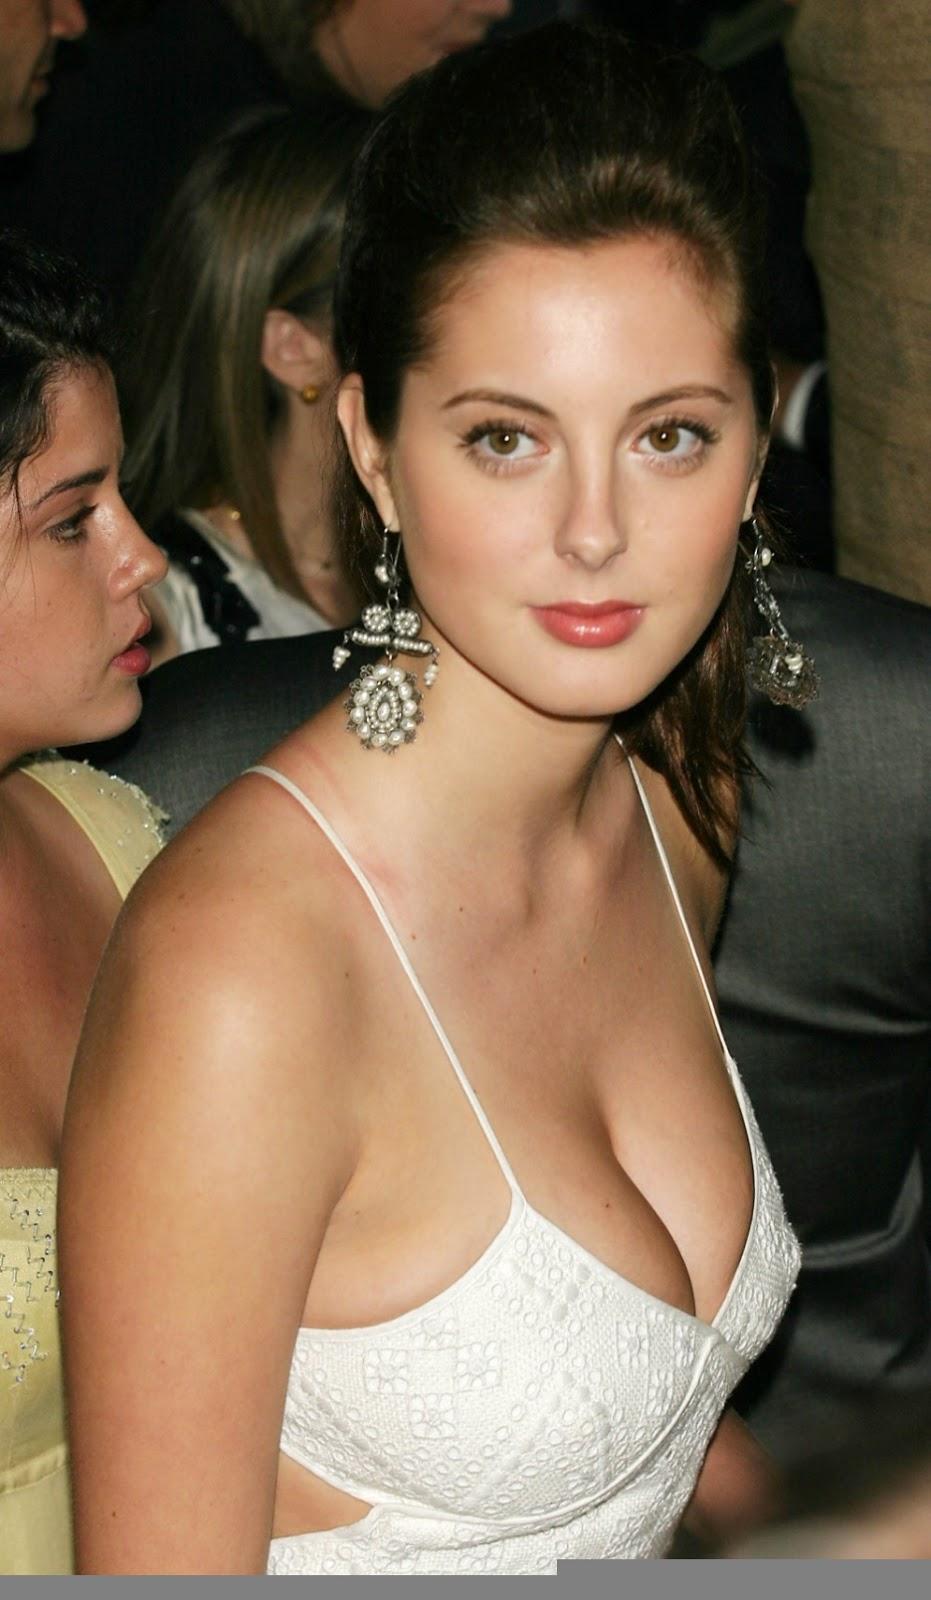 Cleavage Eva Amurri nudes (65 foto and video), Topless, Is a cute, Boobs, in bikini 2006